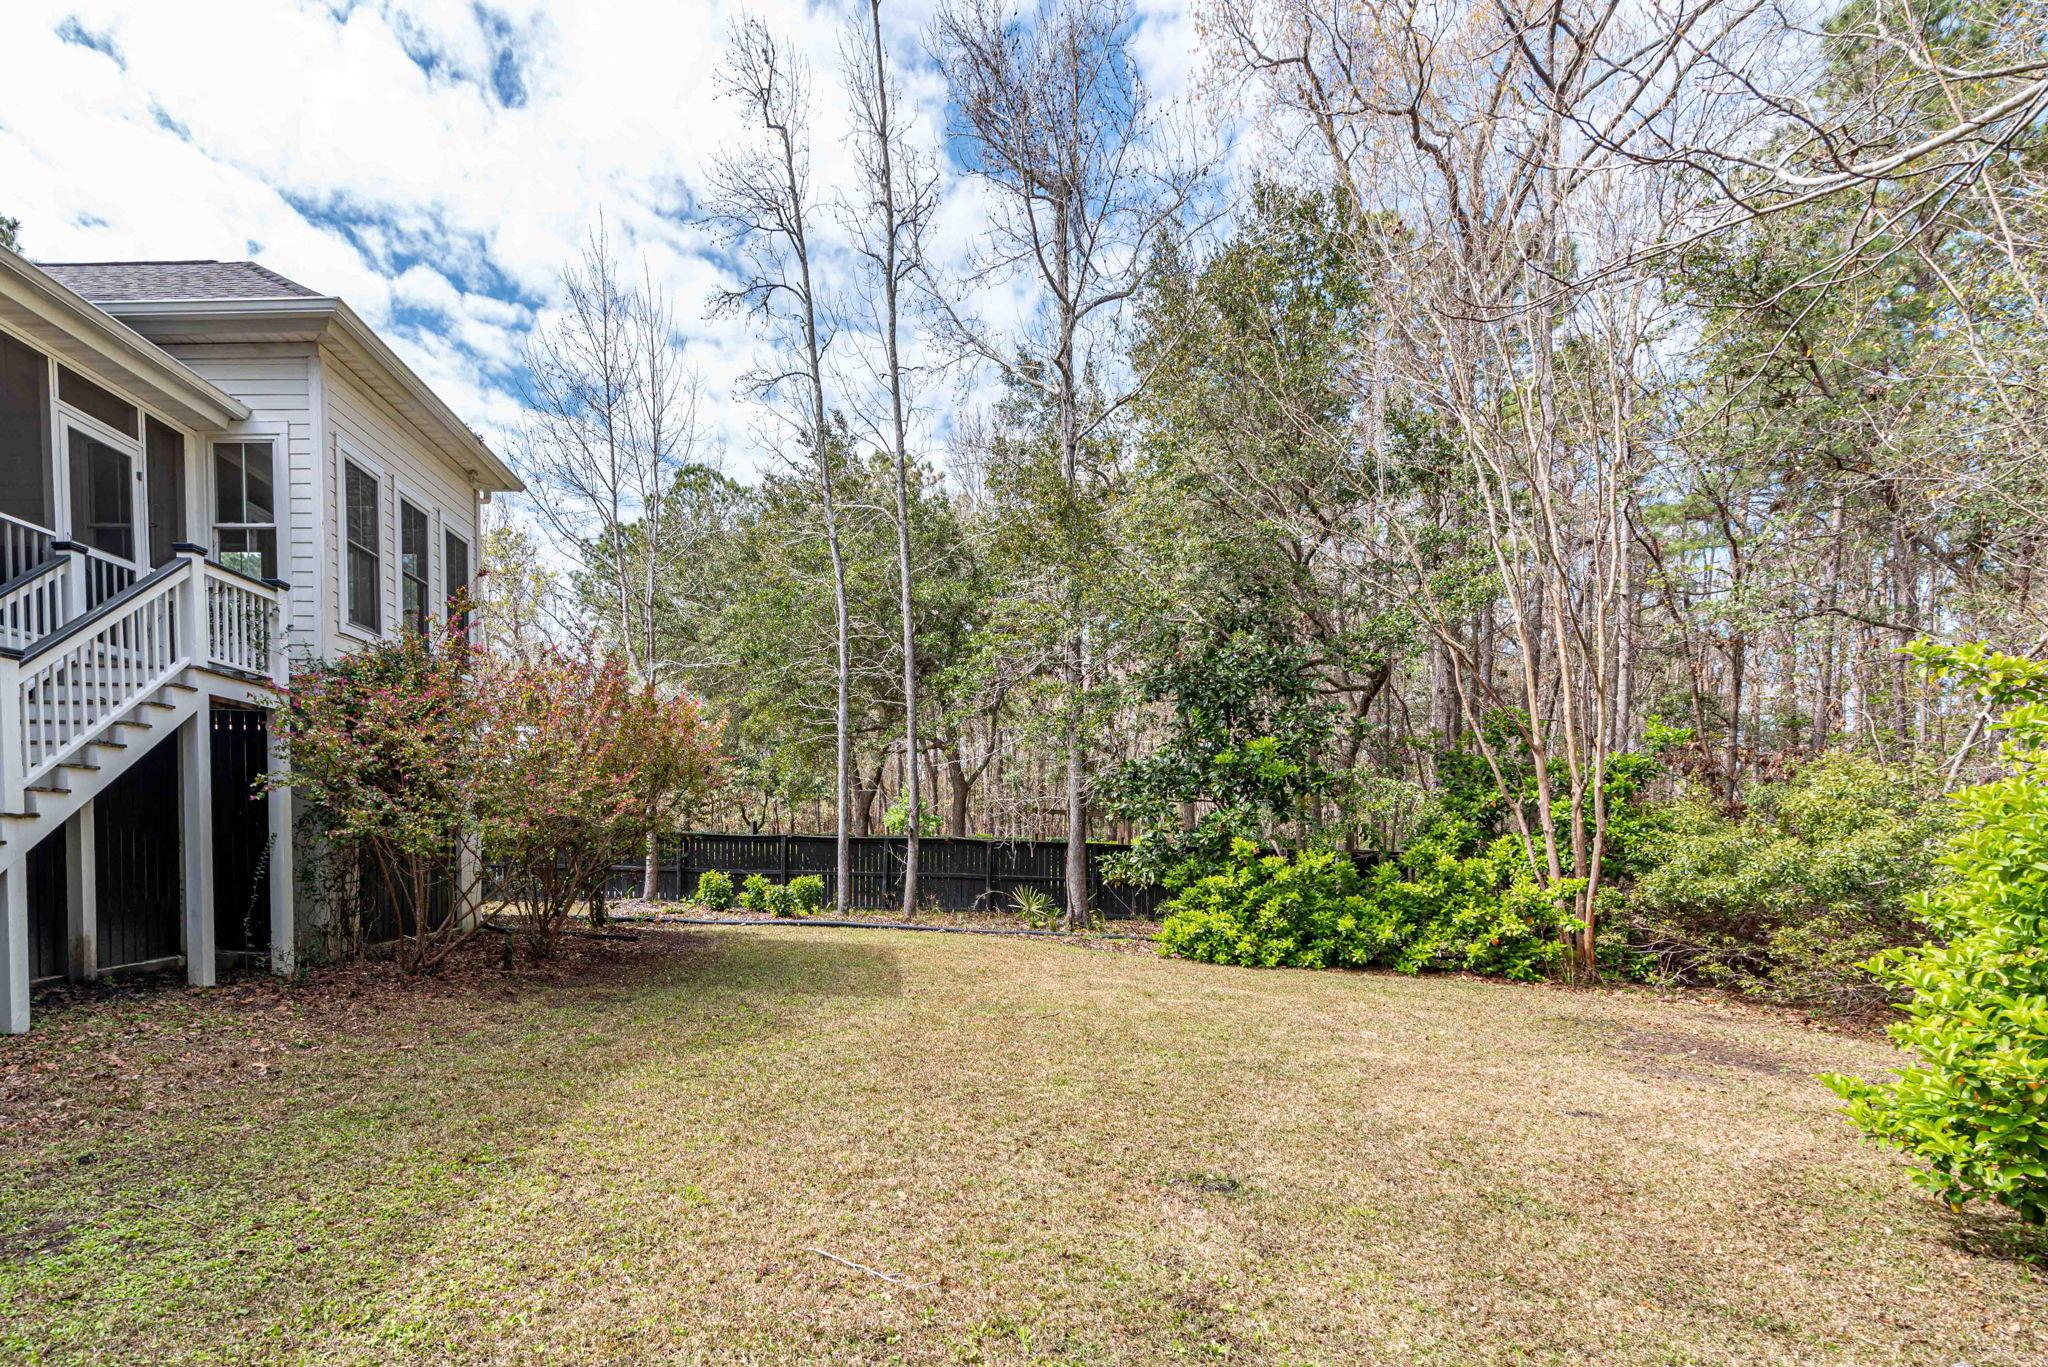 Darrell Creek Homes For Sale - 3794 Saint Ellens, Mount Pleasant, SC - 4